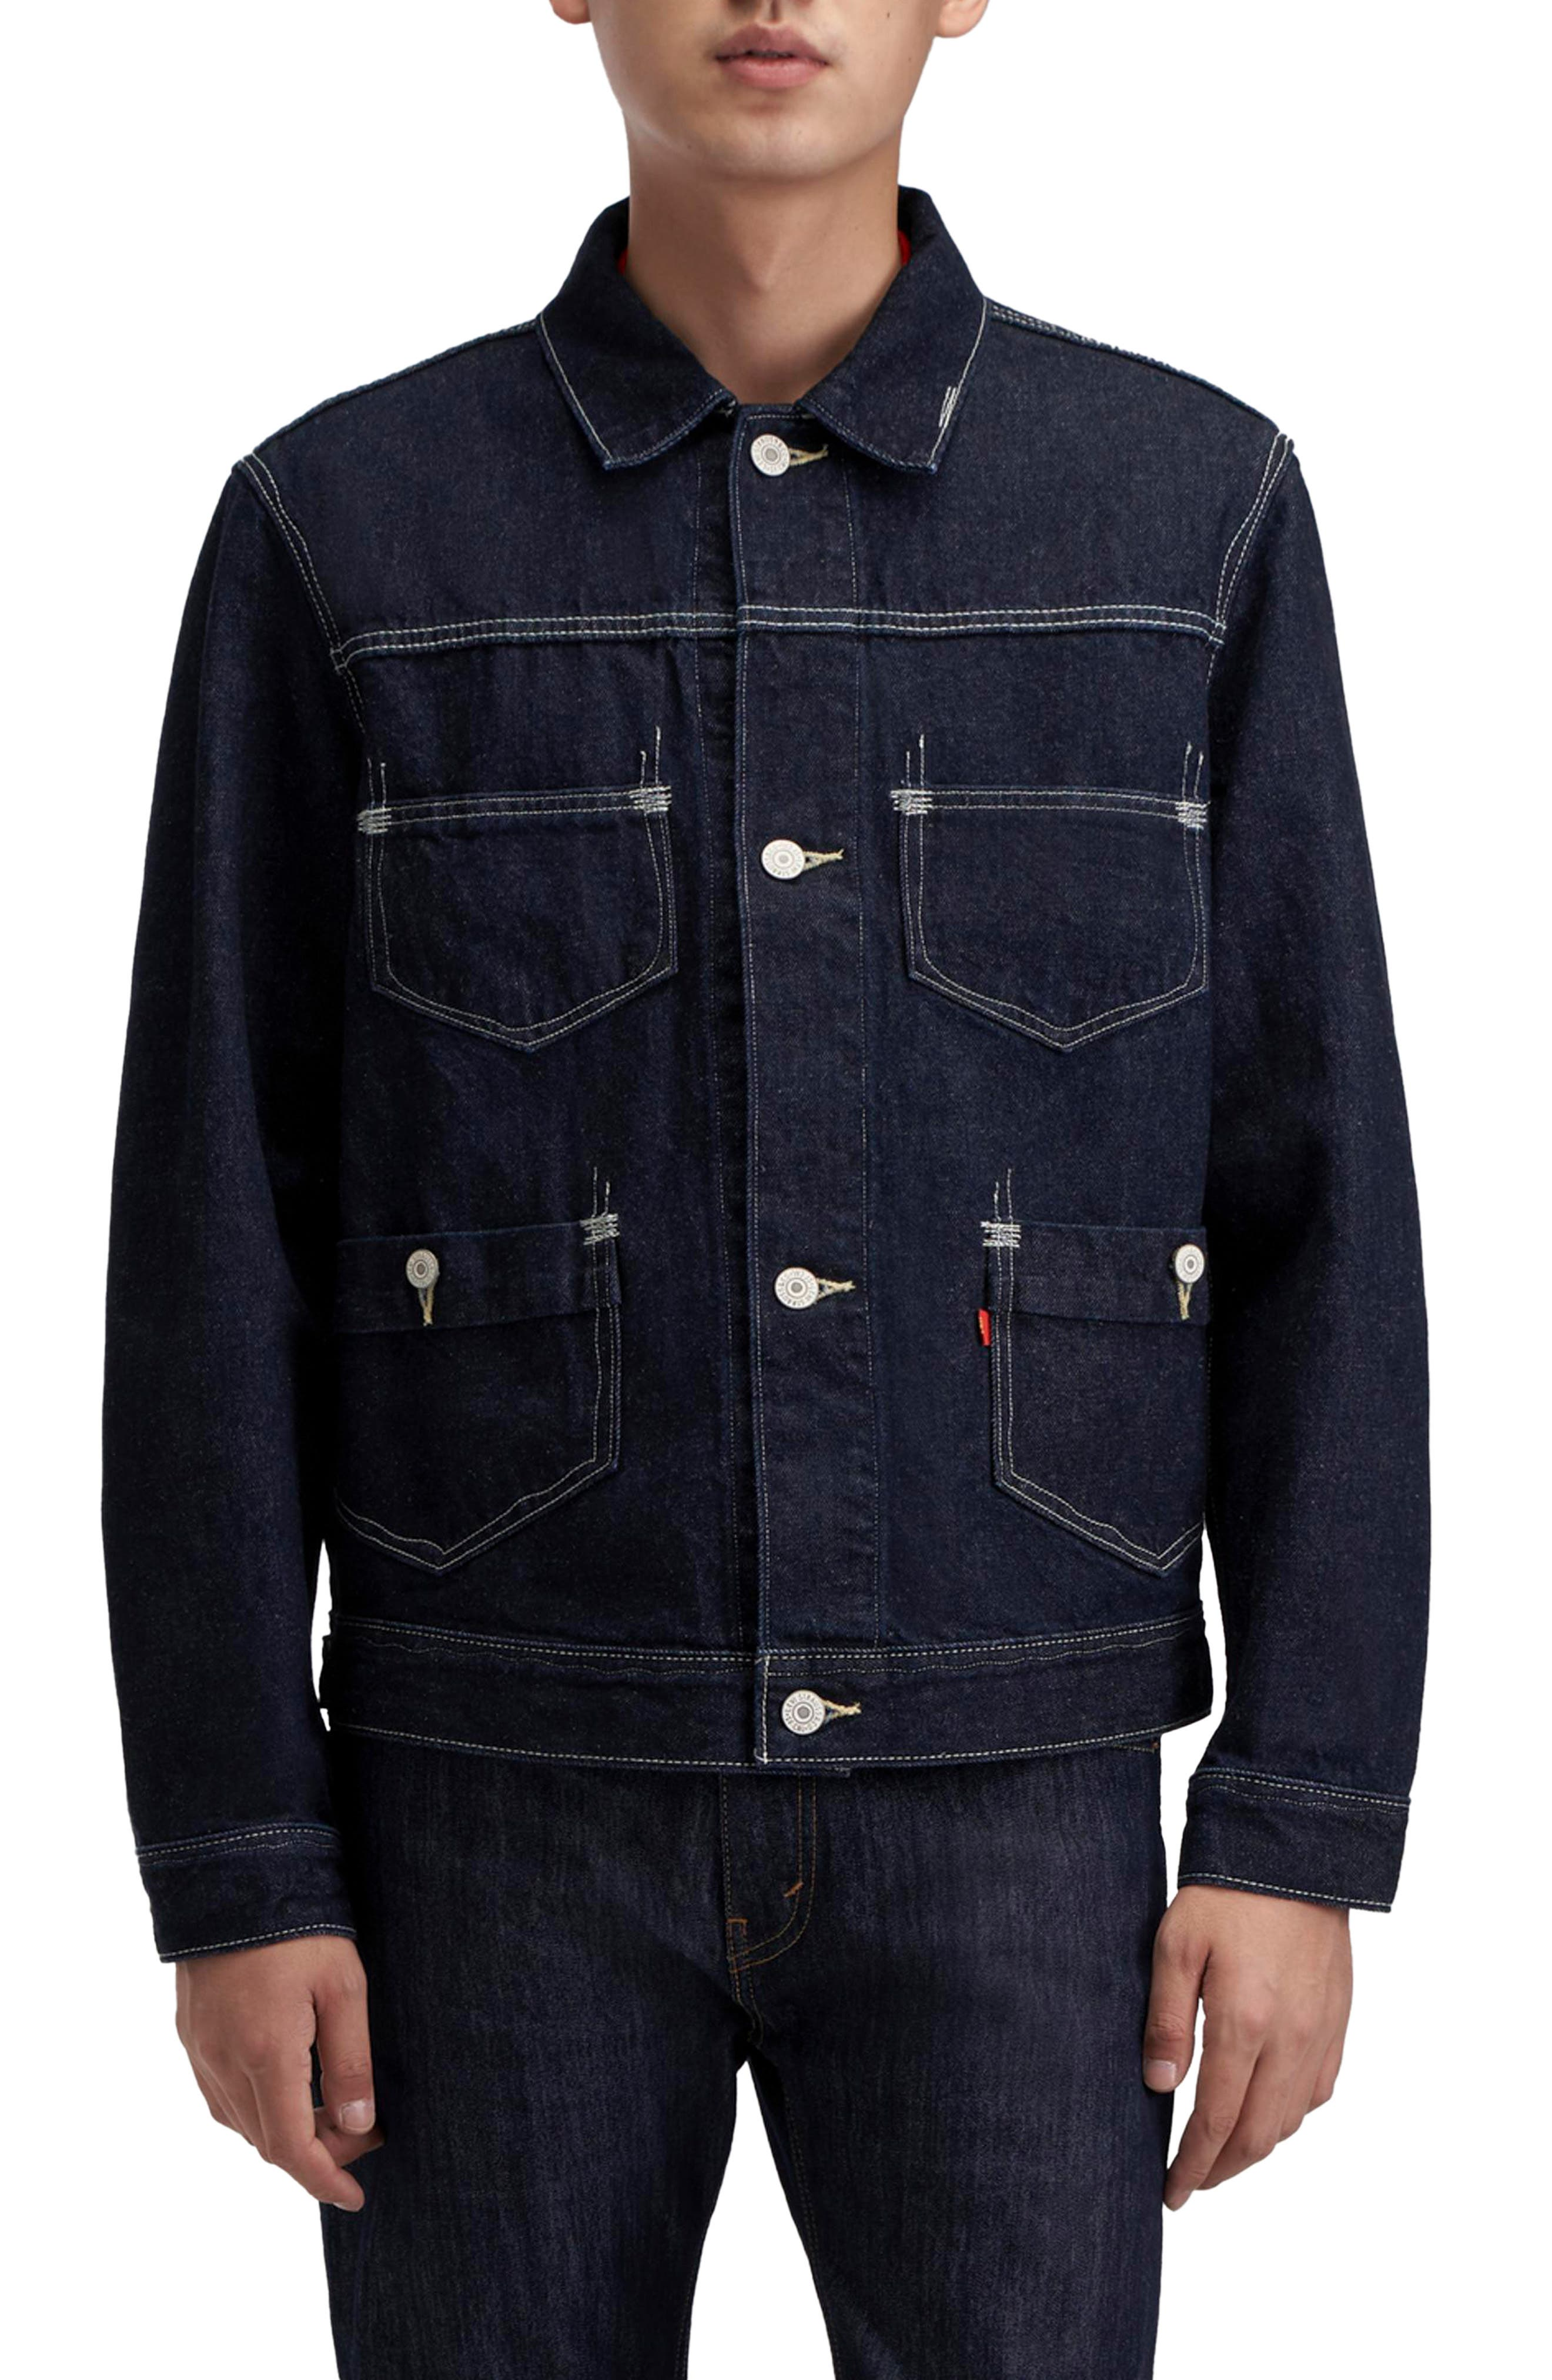 1920s Men's Workwear, Casual Clothes Mens Levis Red Label Denim Trucker Jacket Size Medium - Blue $130.00 AT vintagedancer.com